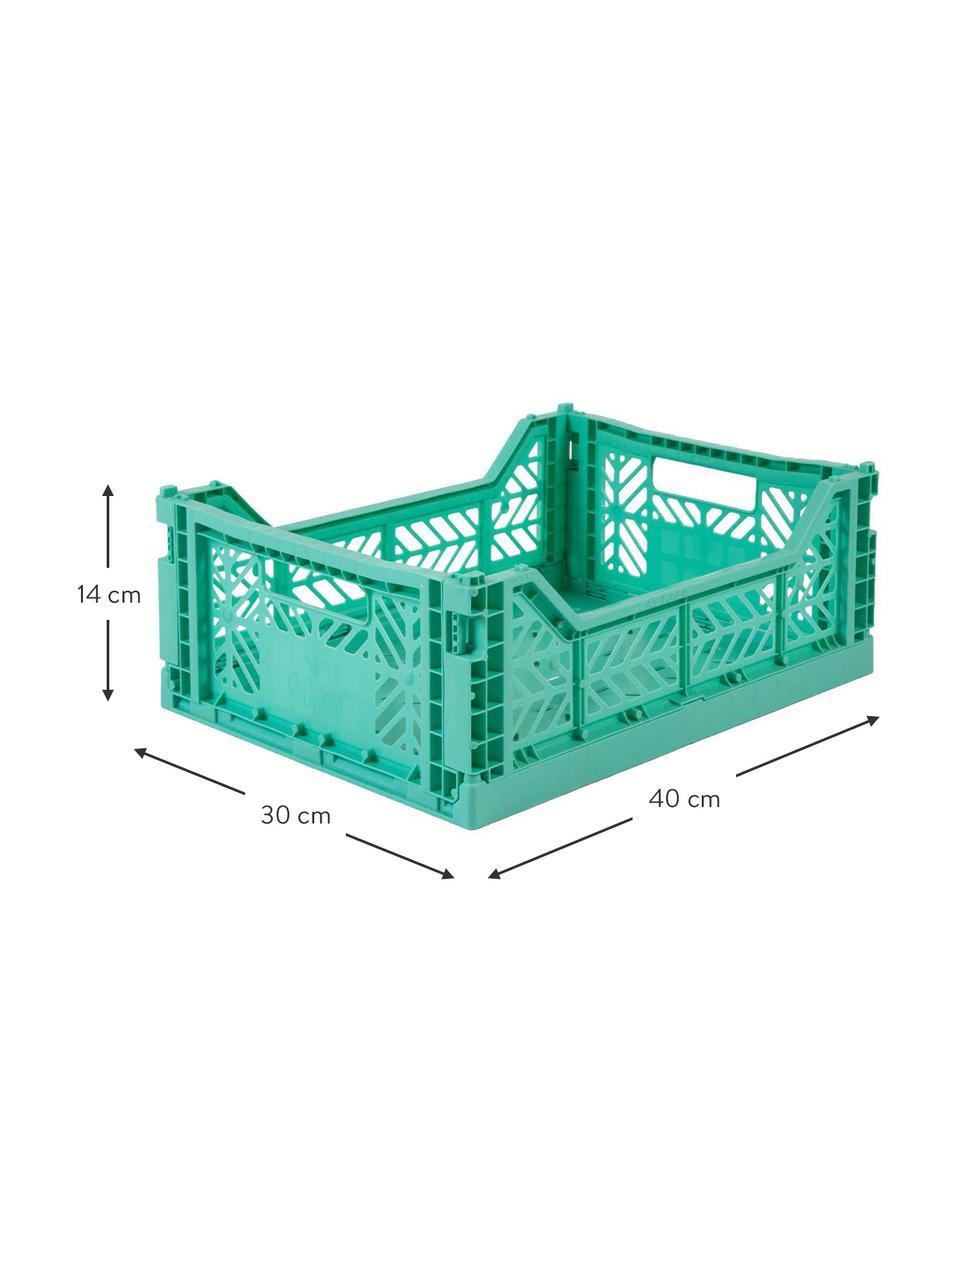 Caja plegable apilable Mint, mediana, Plástico reciclado, Verde menta, An 40 x Al 14 cm